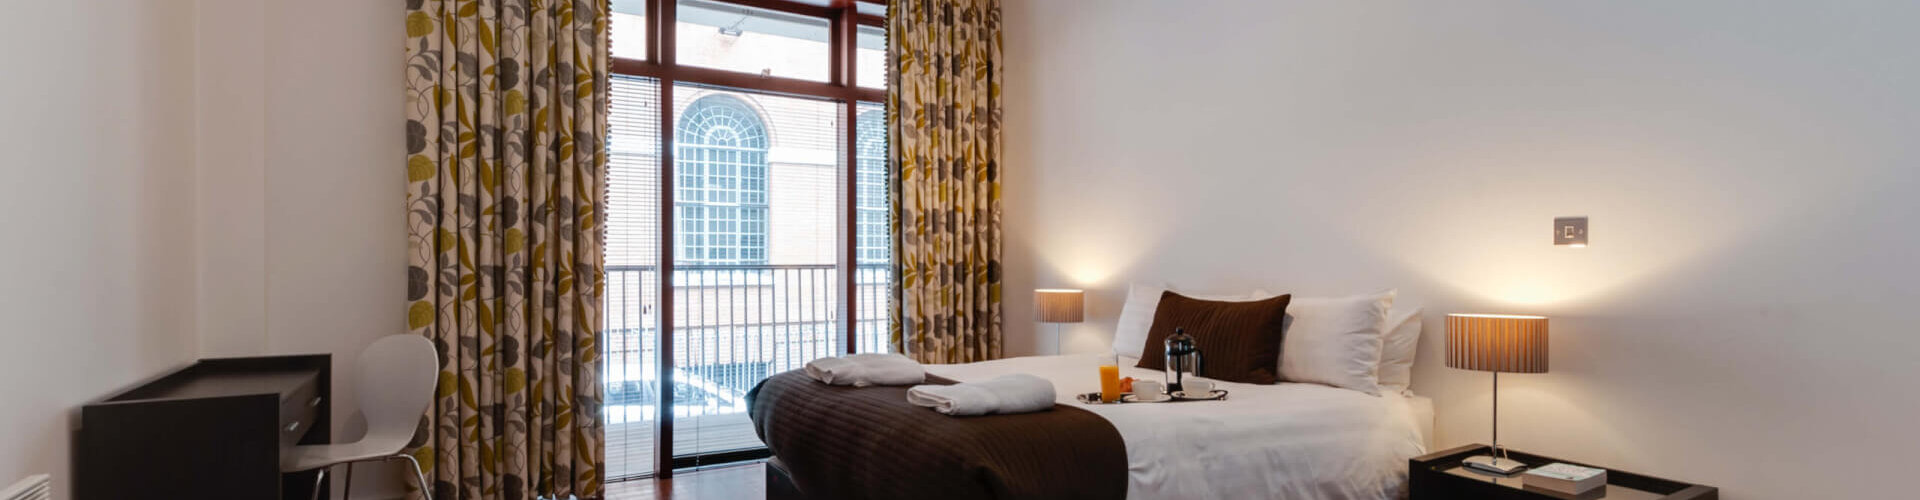 Bedroom Apartment Liverpool